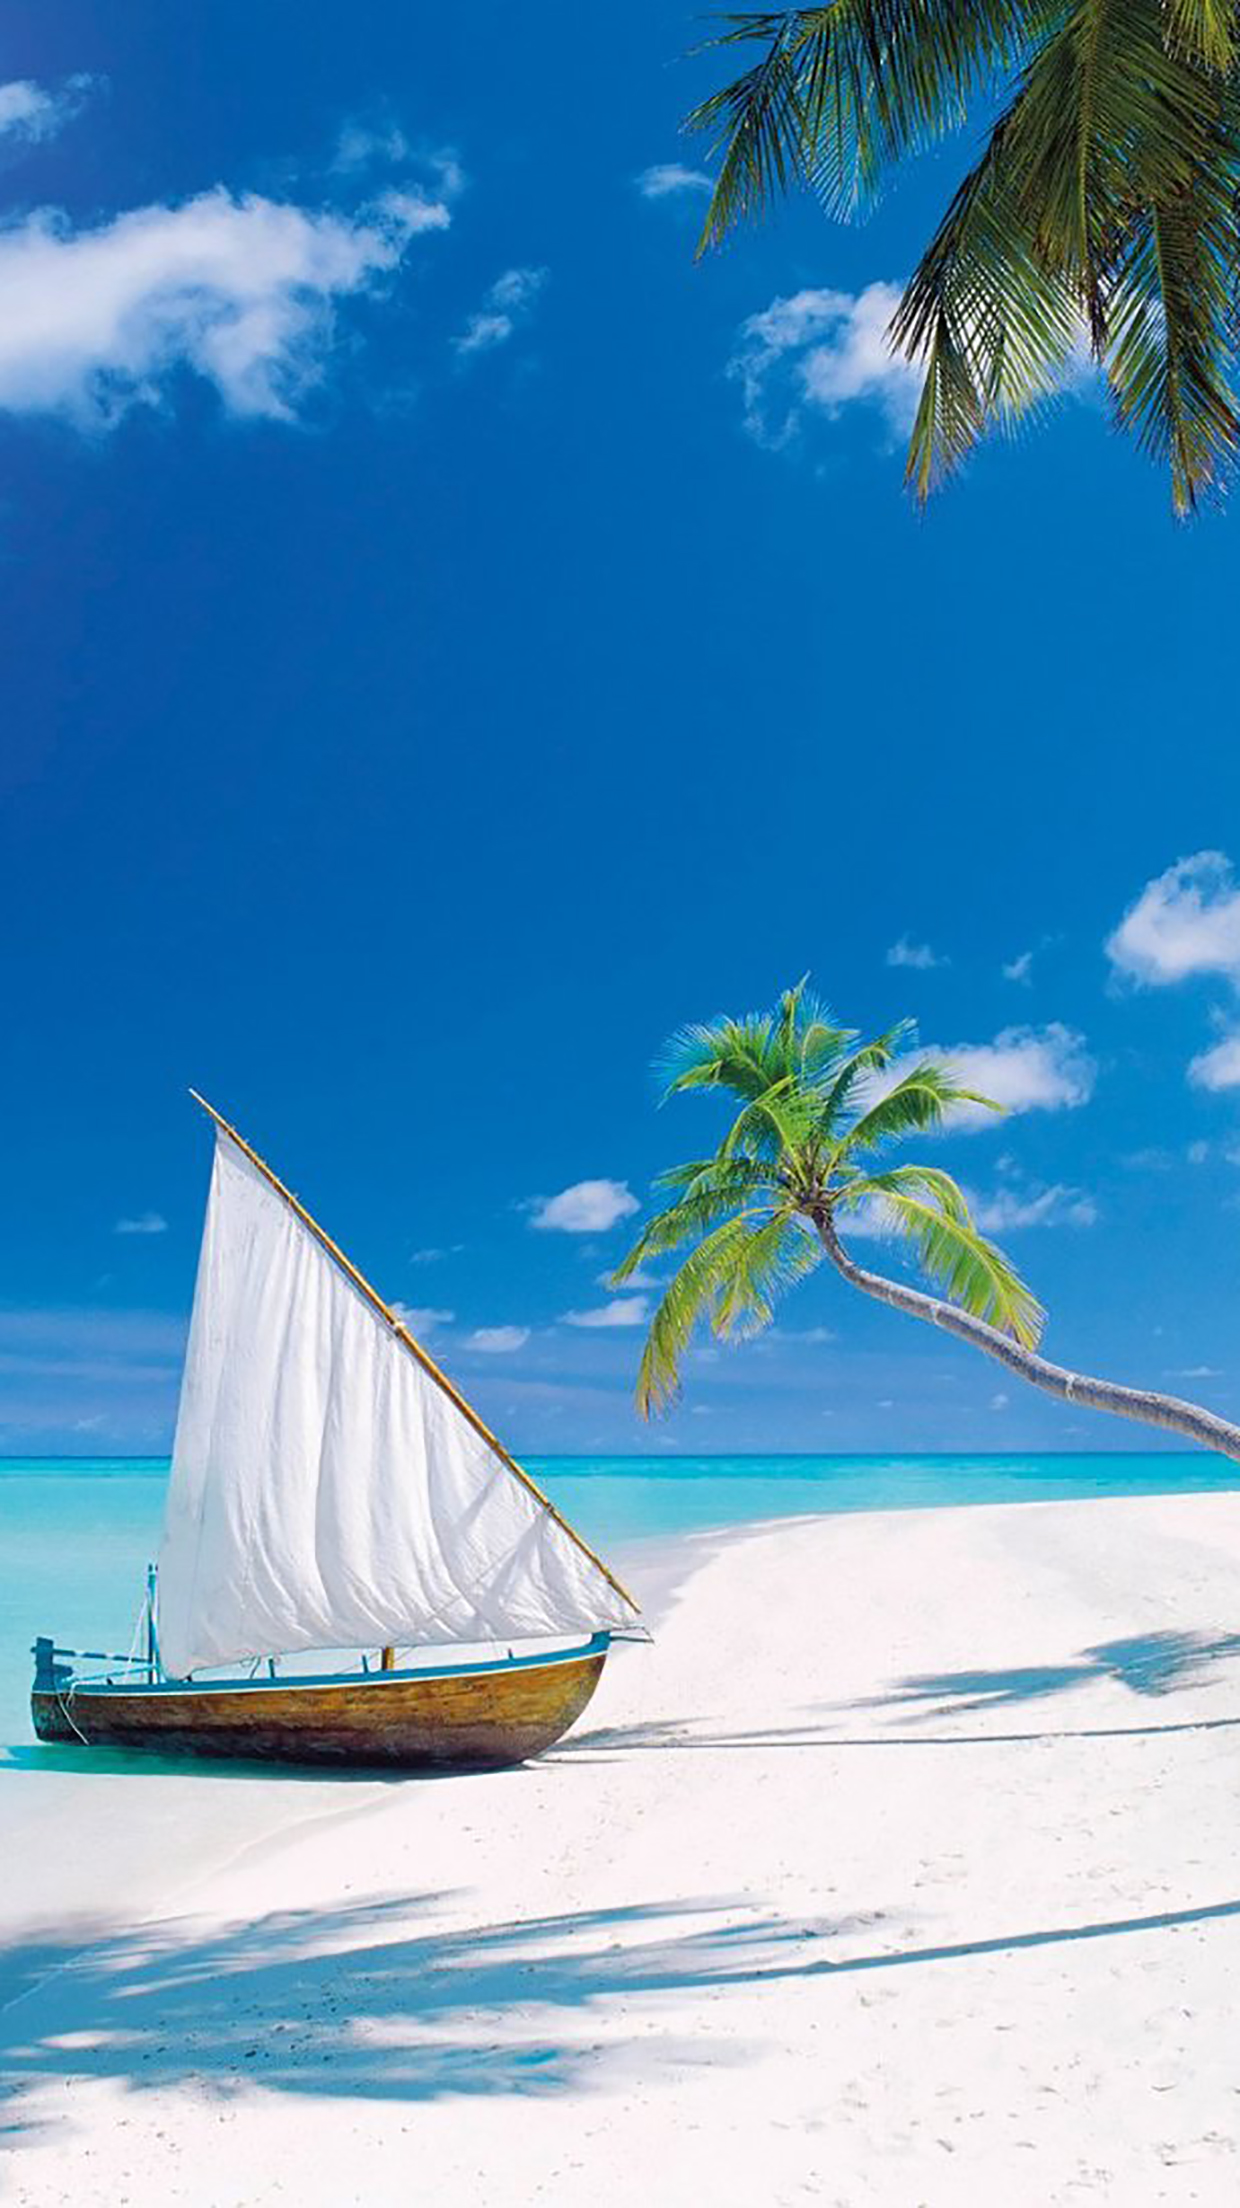 Iles Maldives 1 Wallpaper For Iphone X 8 7 6 Free